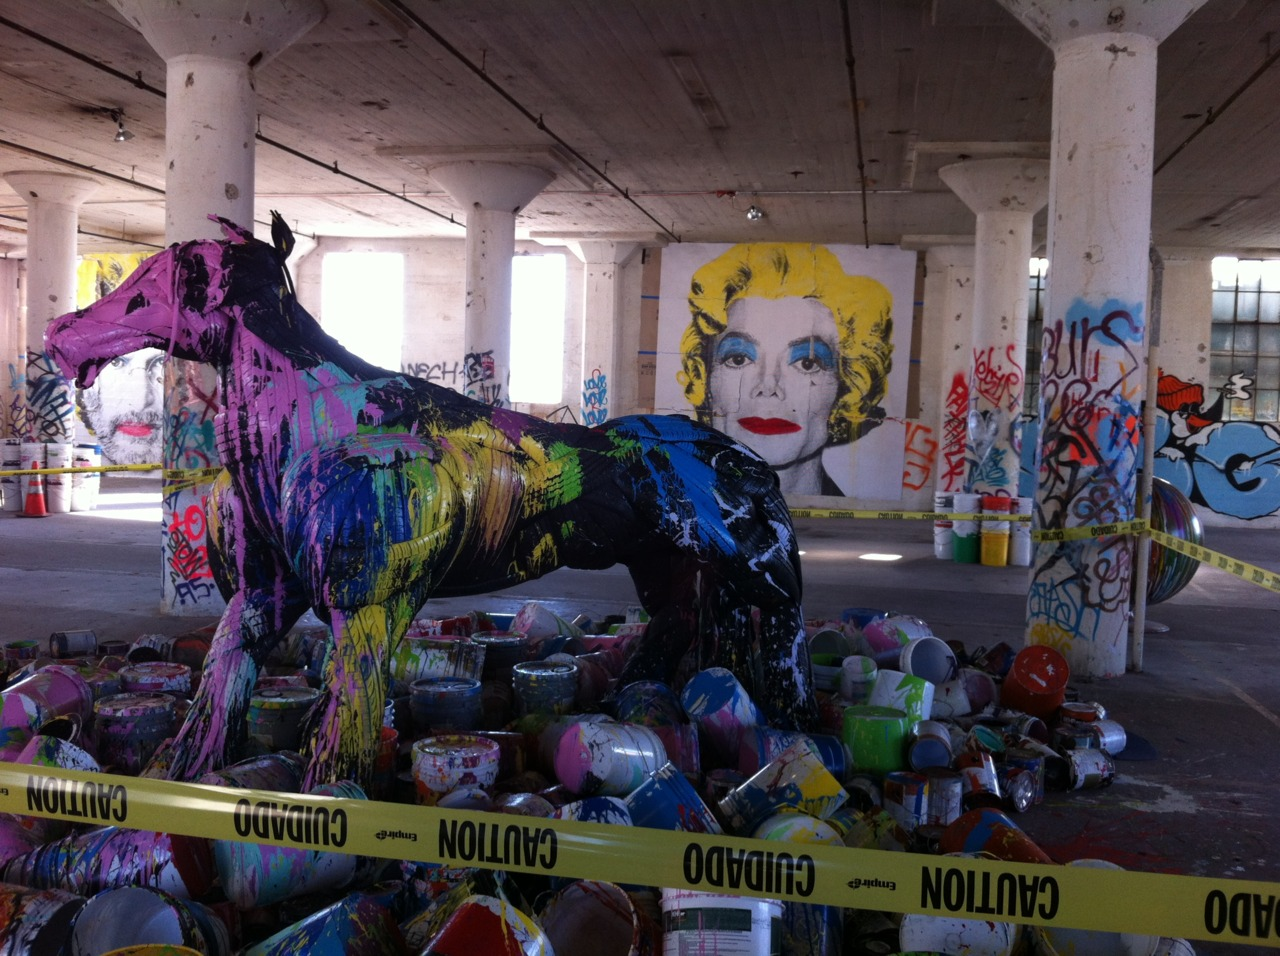 Art-Love-Alicia-Keys-Swizz-Beatz-at-Mr.-Brainwash-exhibit-6.jpg